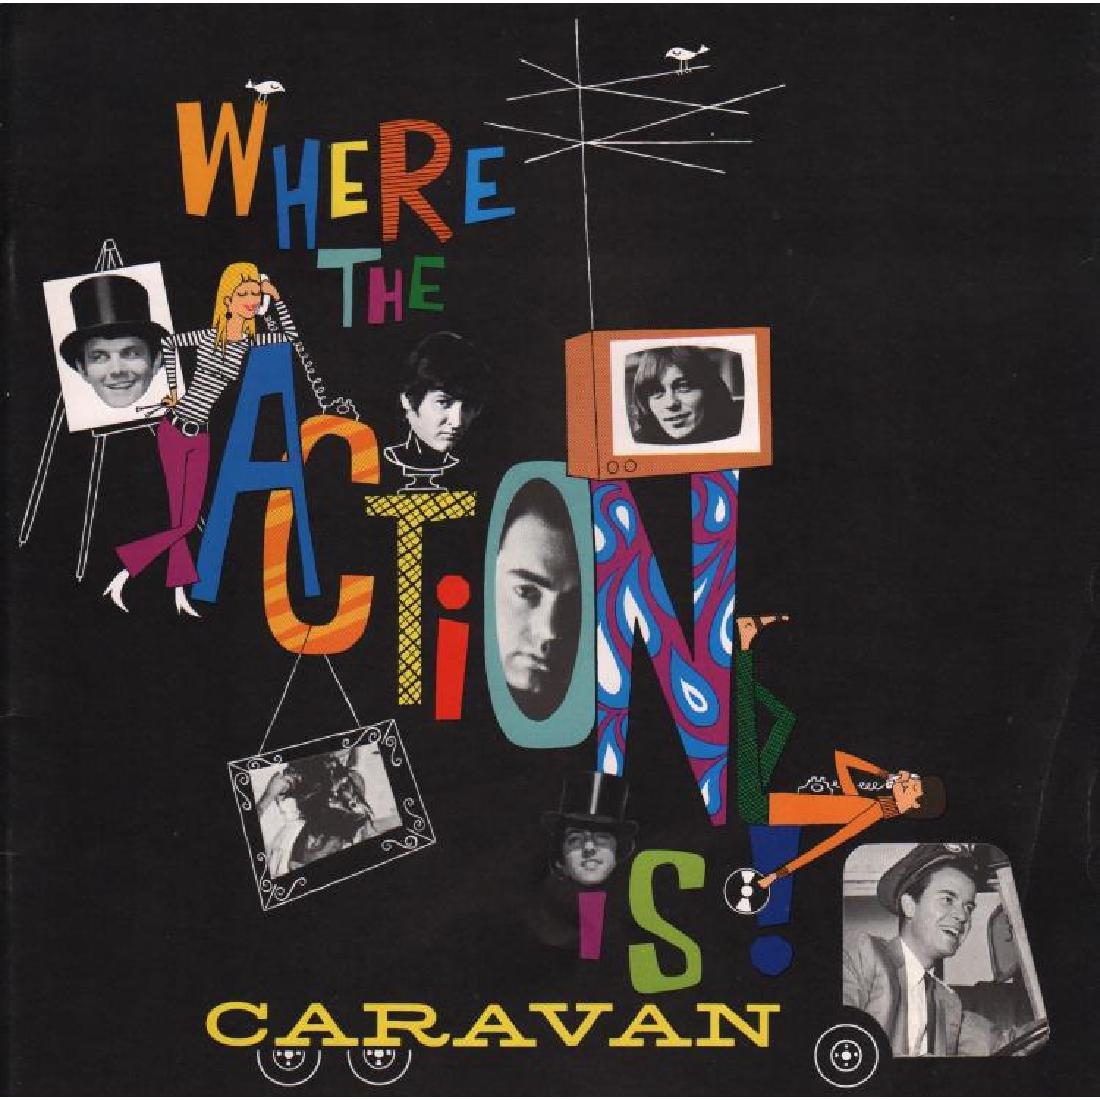 Neil Diamond - Caravan Tour - 1967 Program